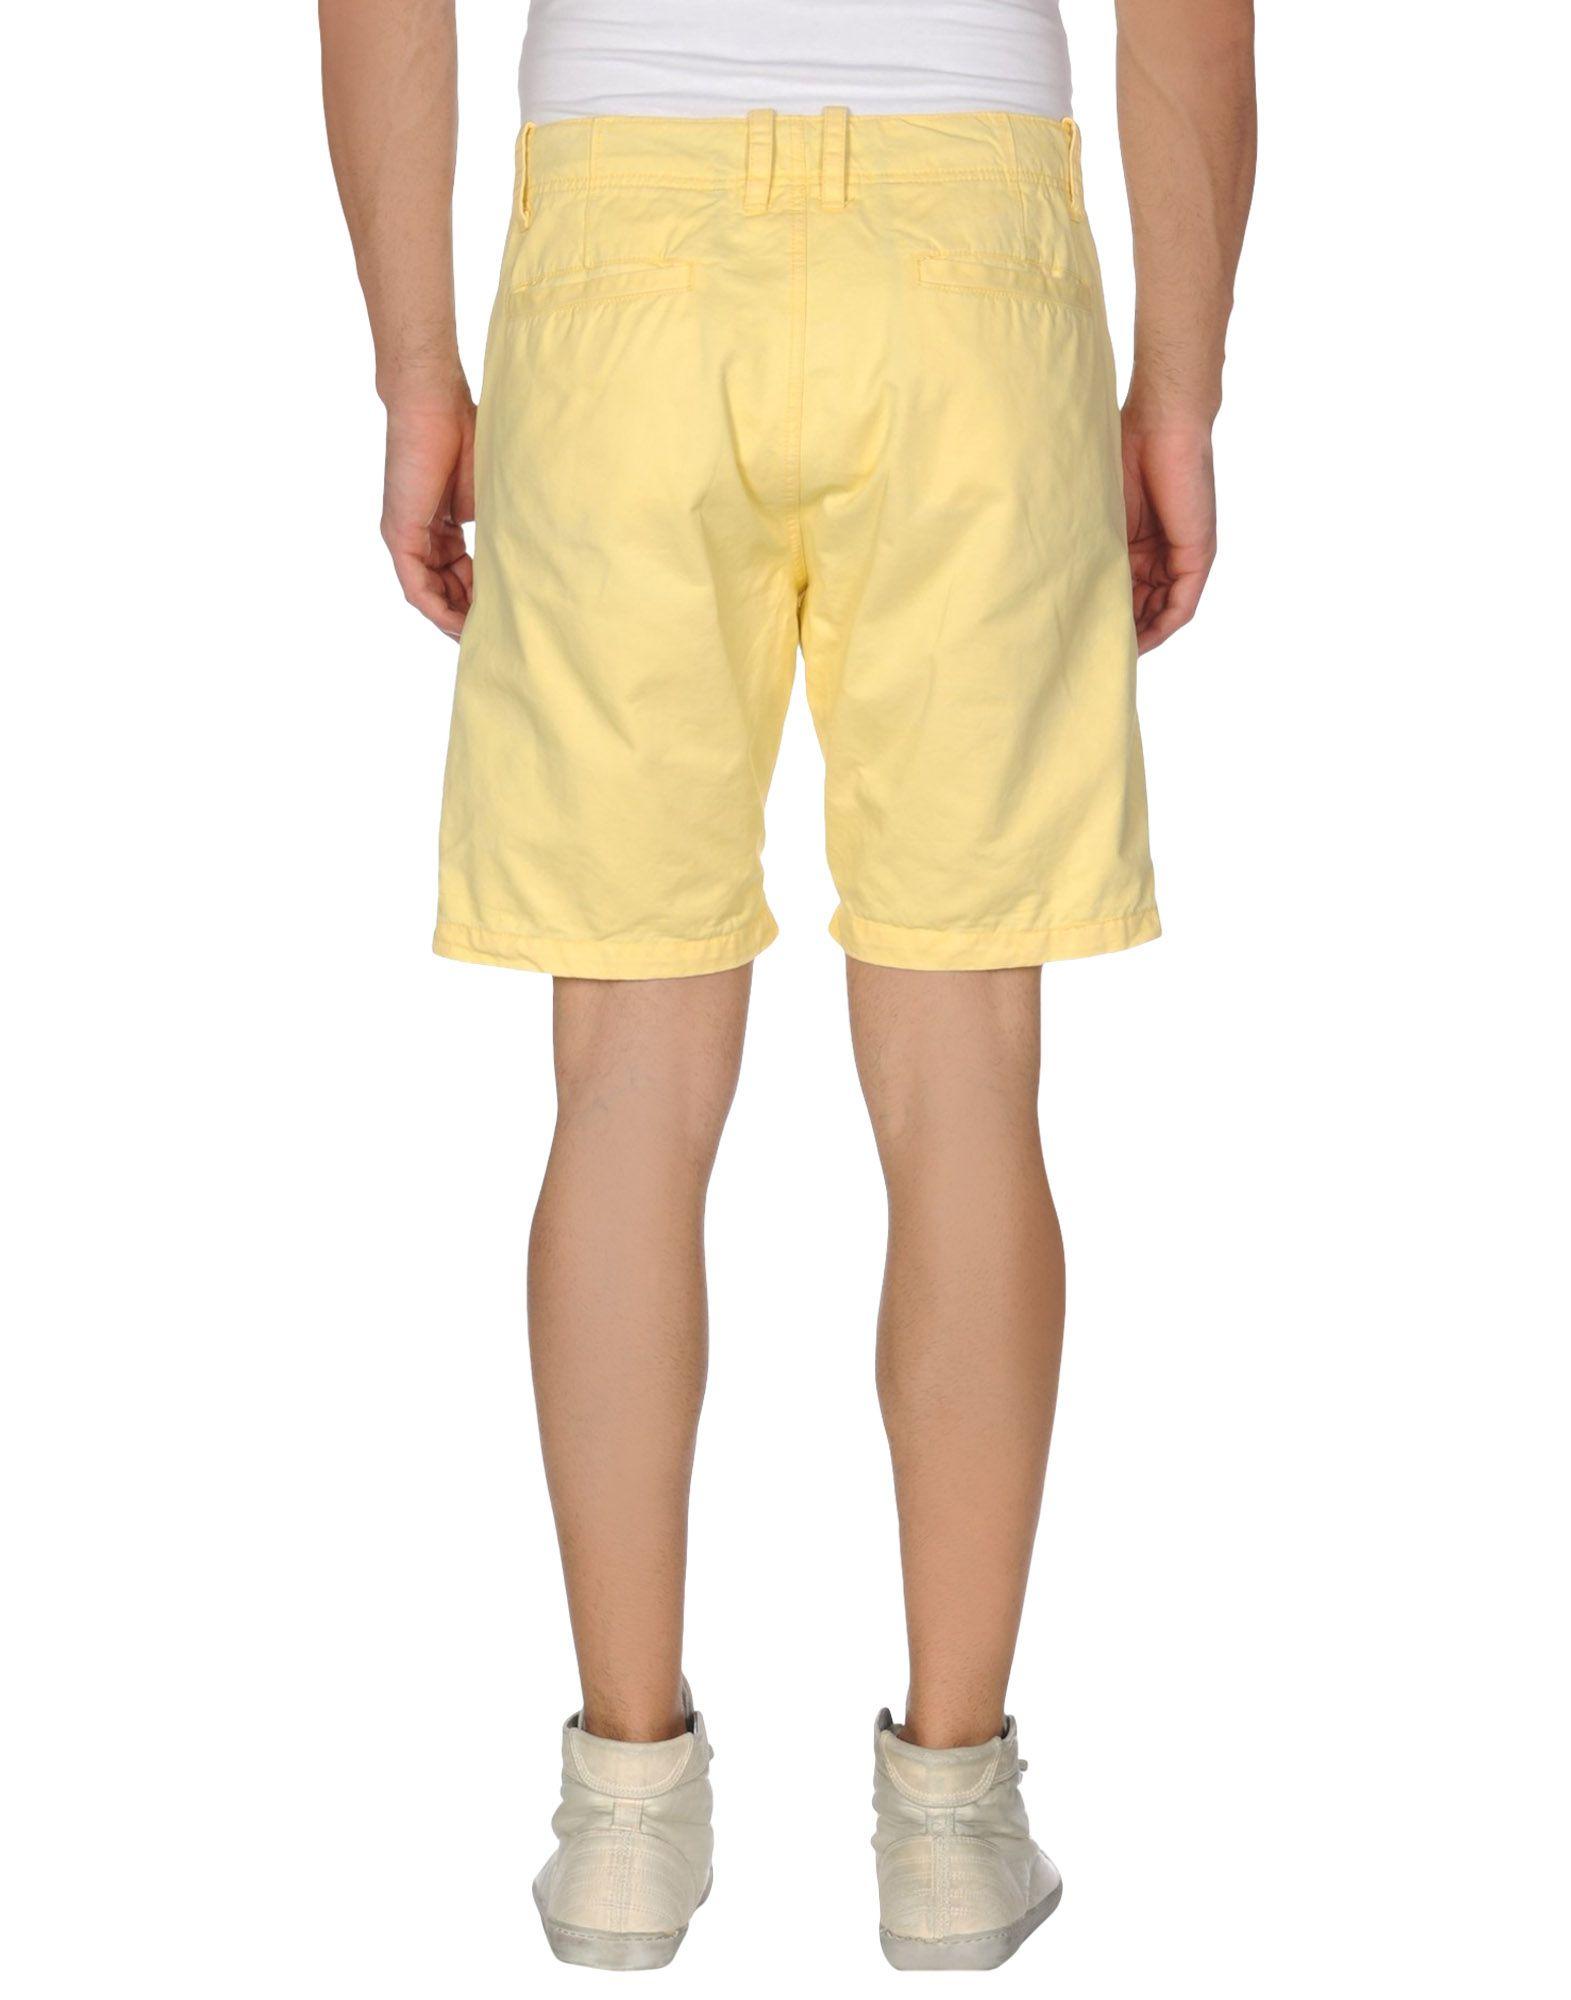 jack jones bermuda shorts in yellow for men lyst. Black Bedroom Furniture Sets. Home Design Ideas